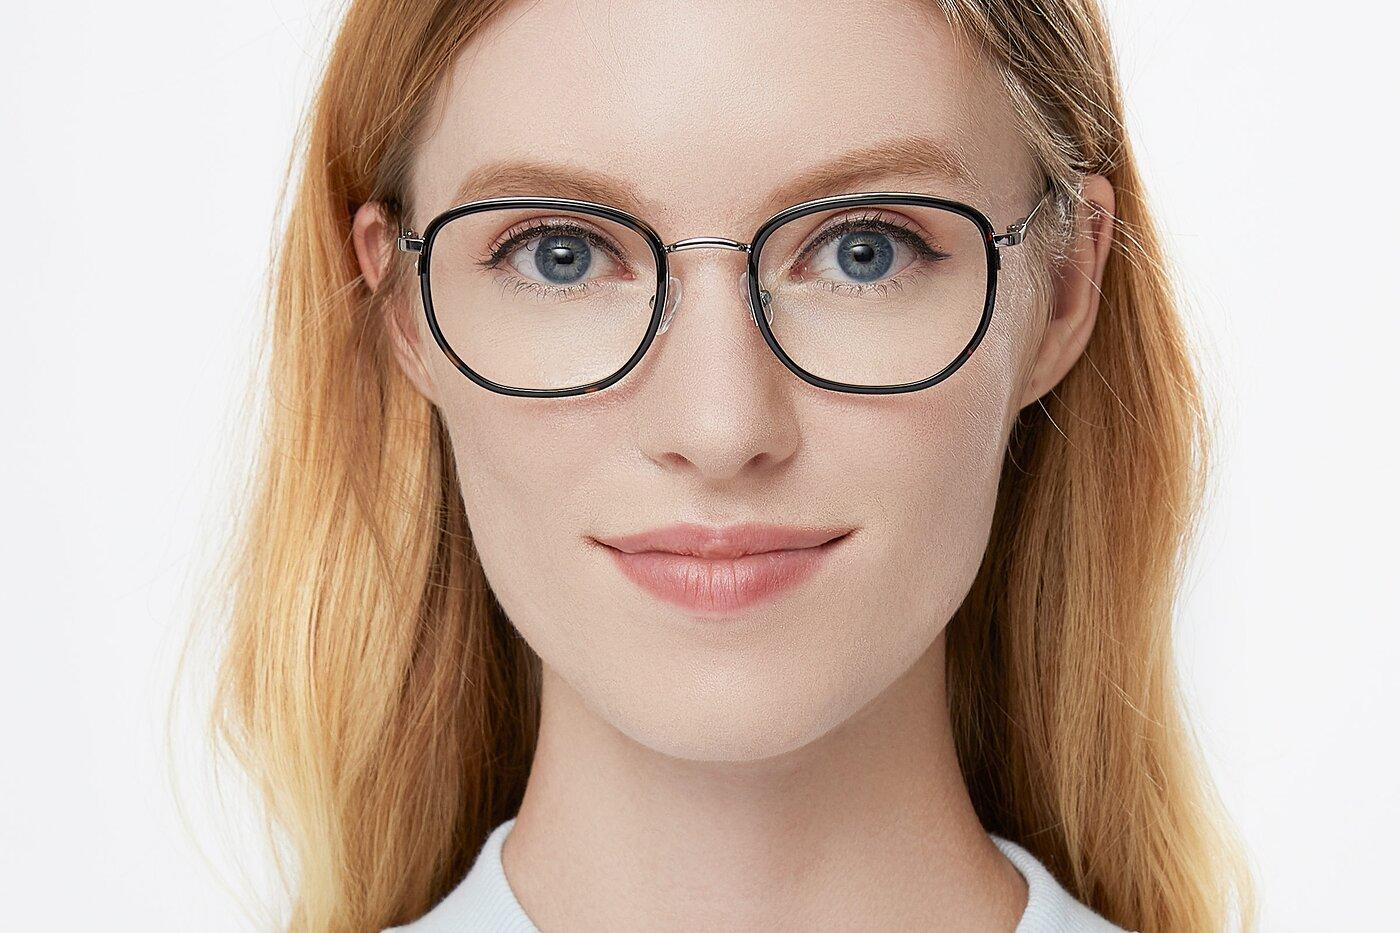 Sliver-Tortoise Hipster Metal Bridge Geometric Eyeglasses